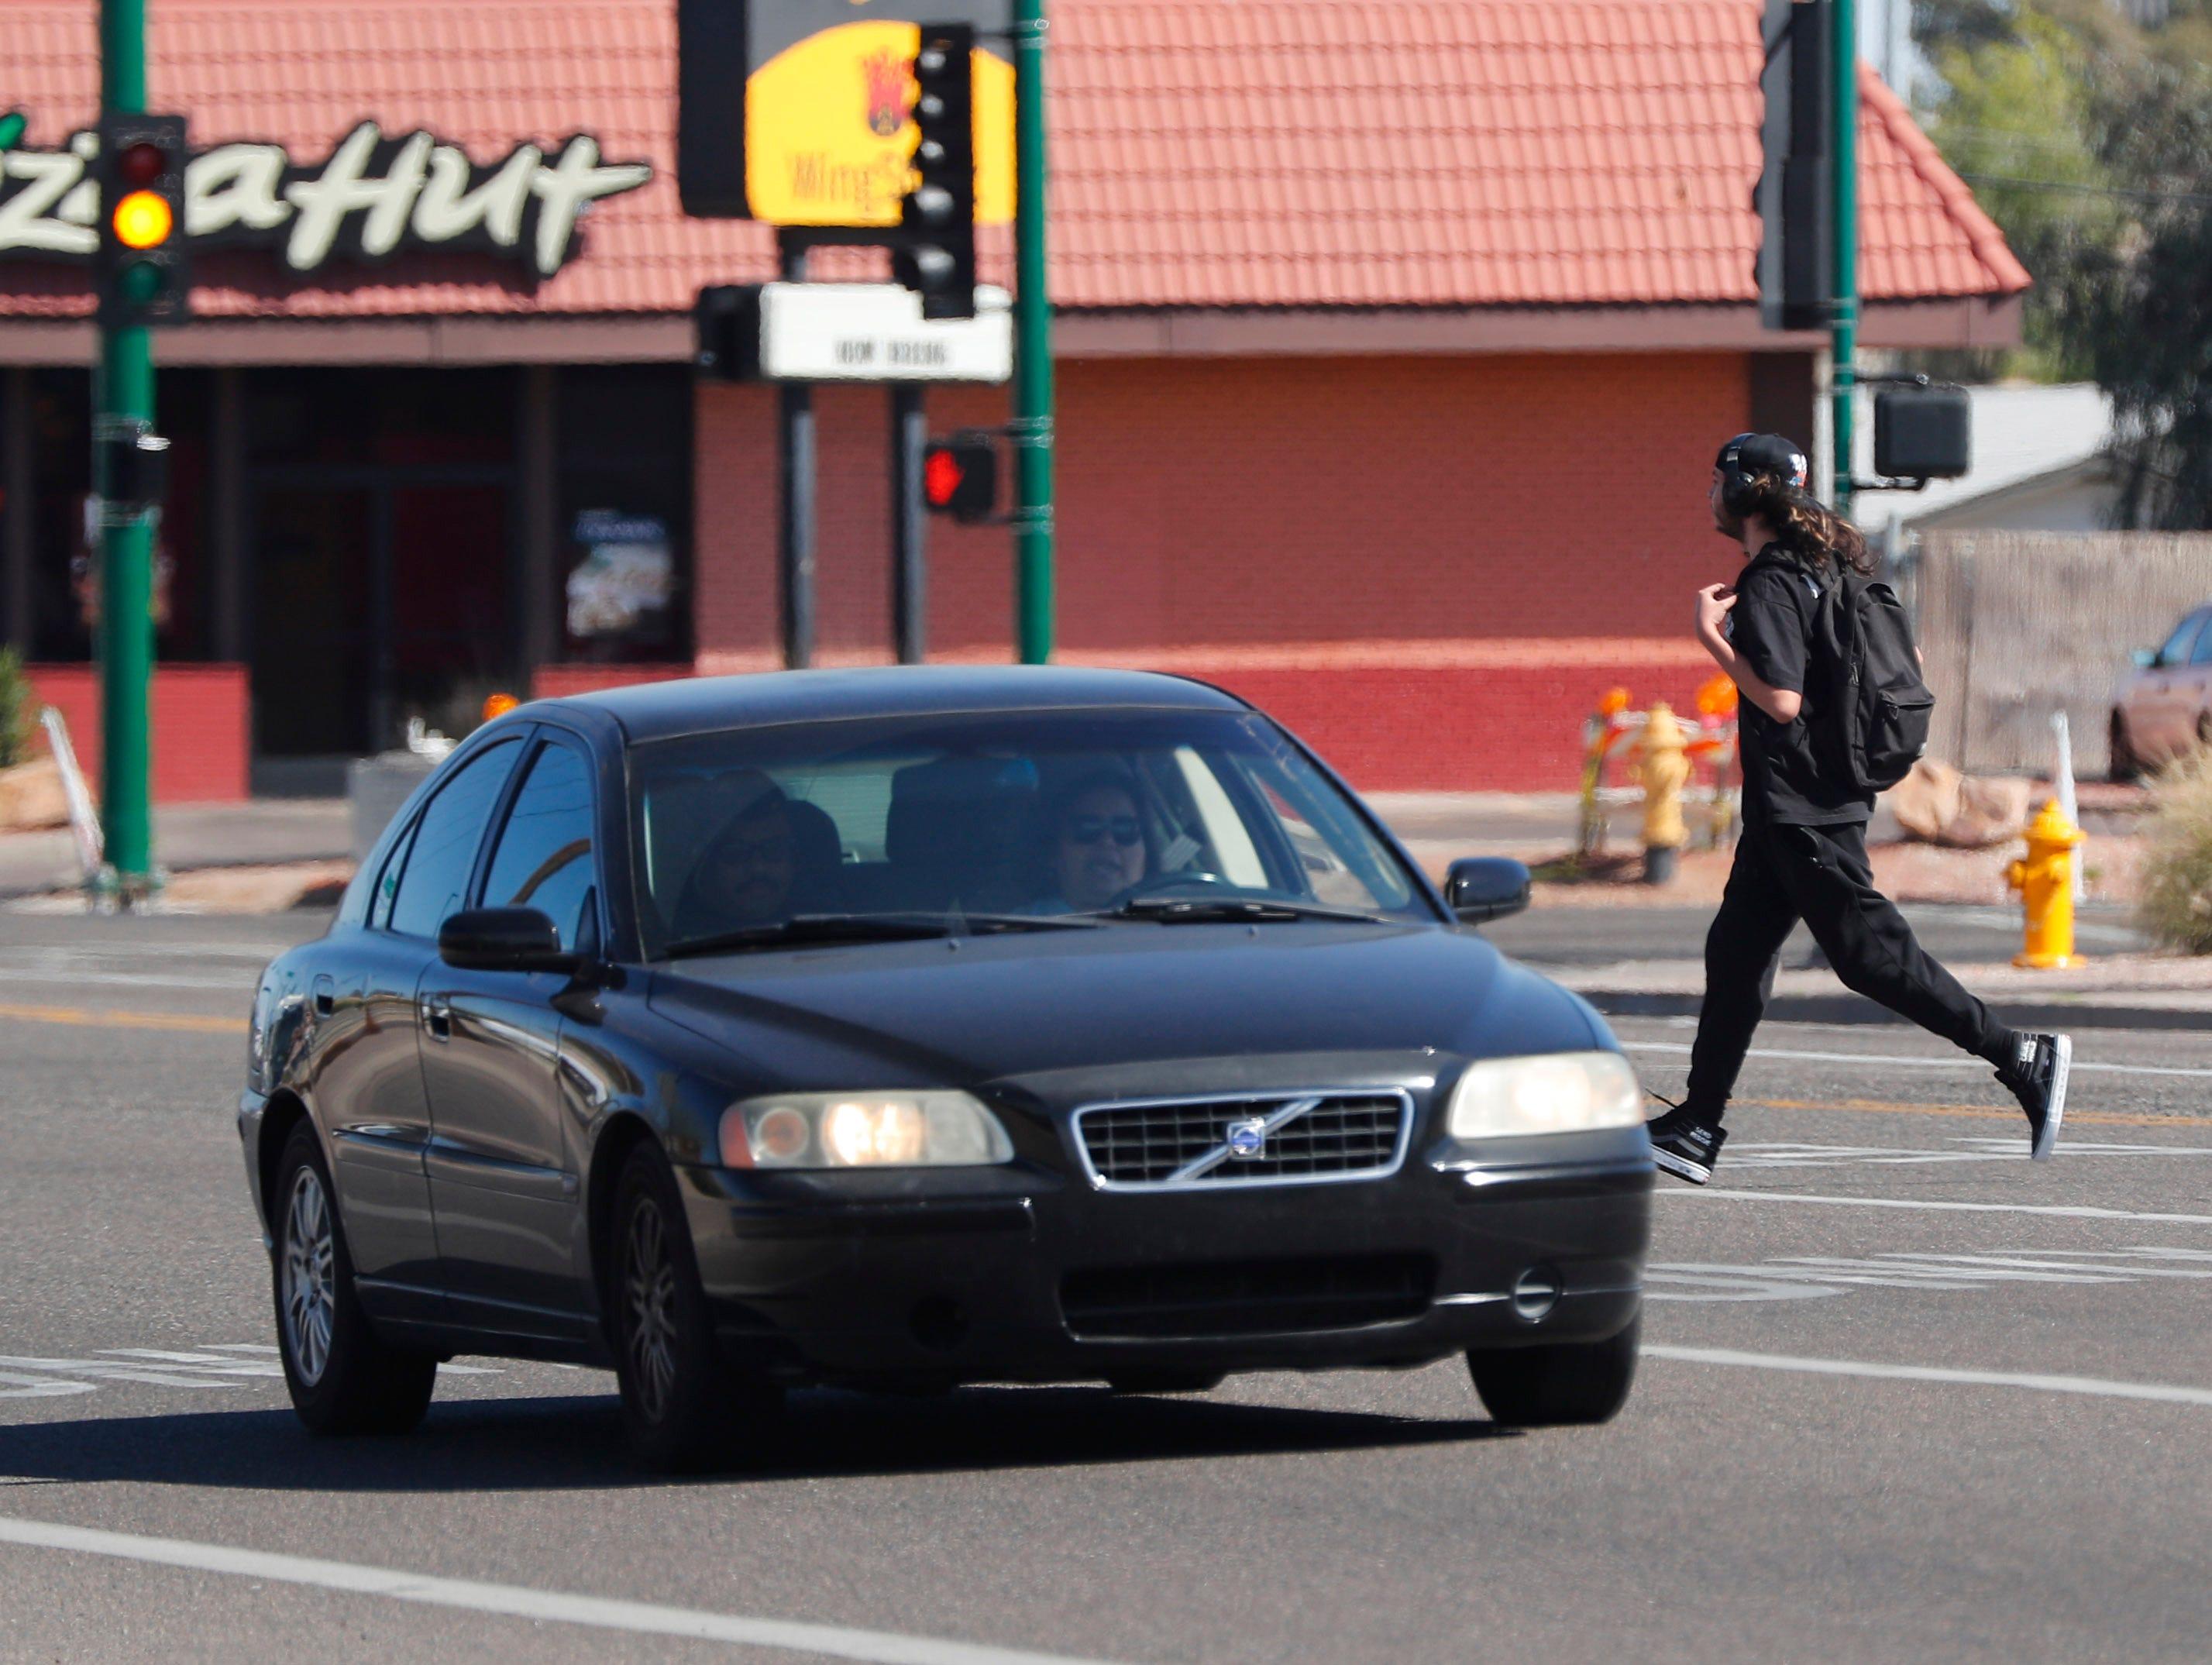 A pedestrian crosses Indian School Road west of 19th Avenue in Phoenix on March 10, 2019.